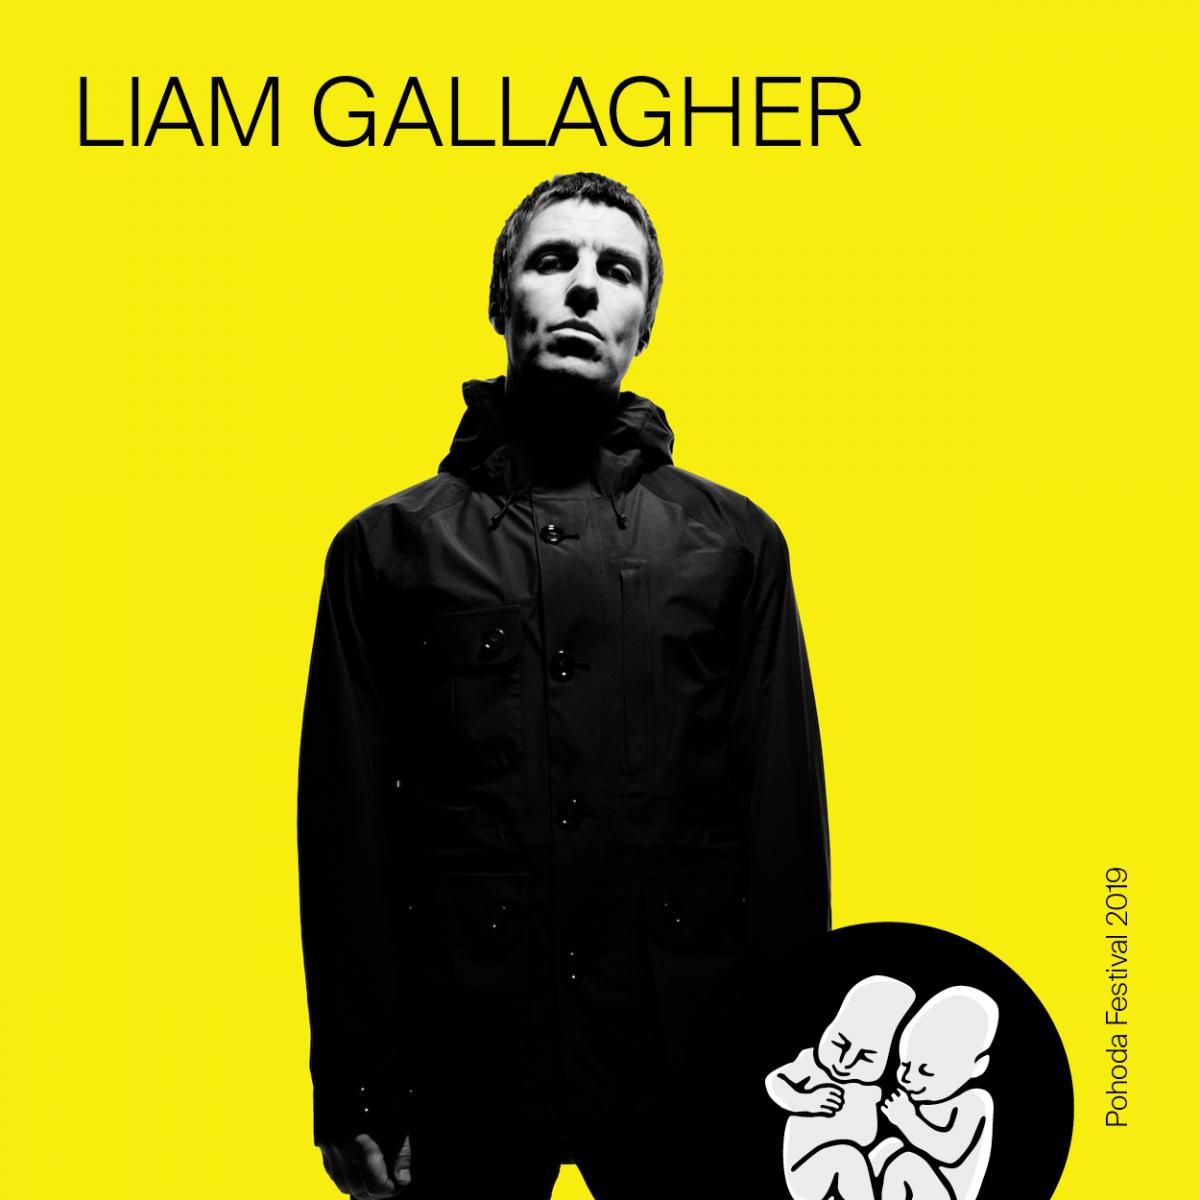 "Liam gallagher – ""posledná rokenrolová hviezda"" na pohode 2019"